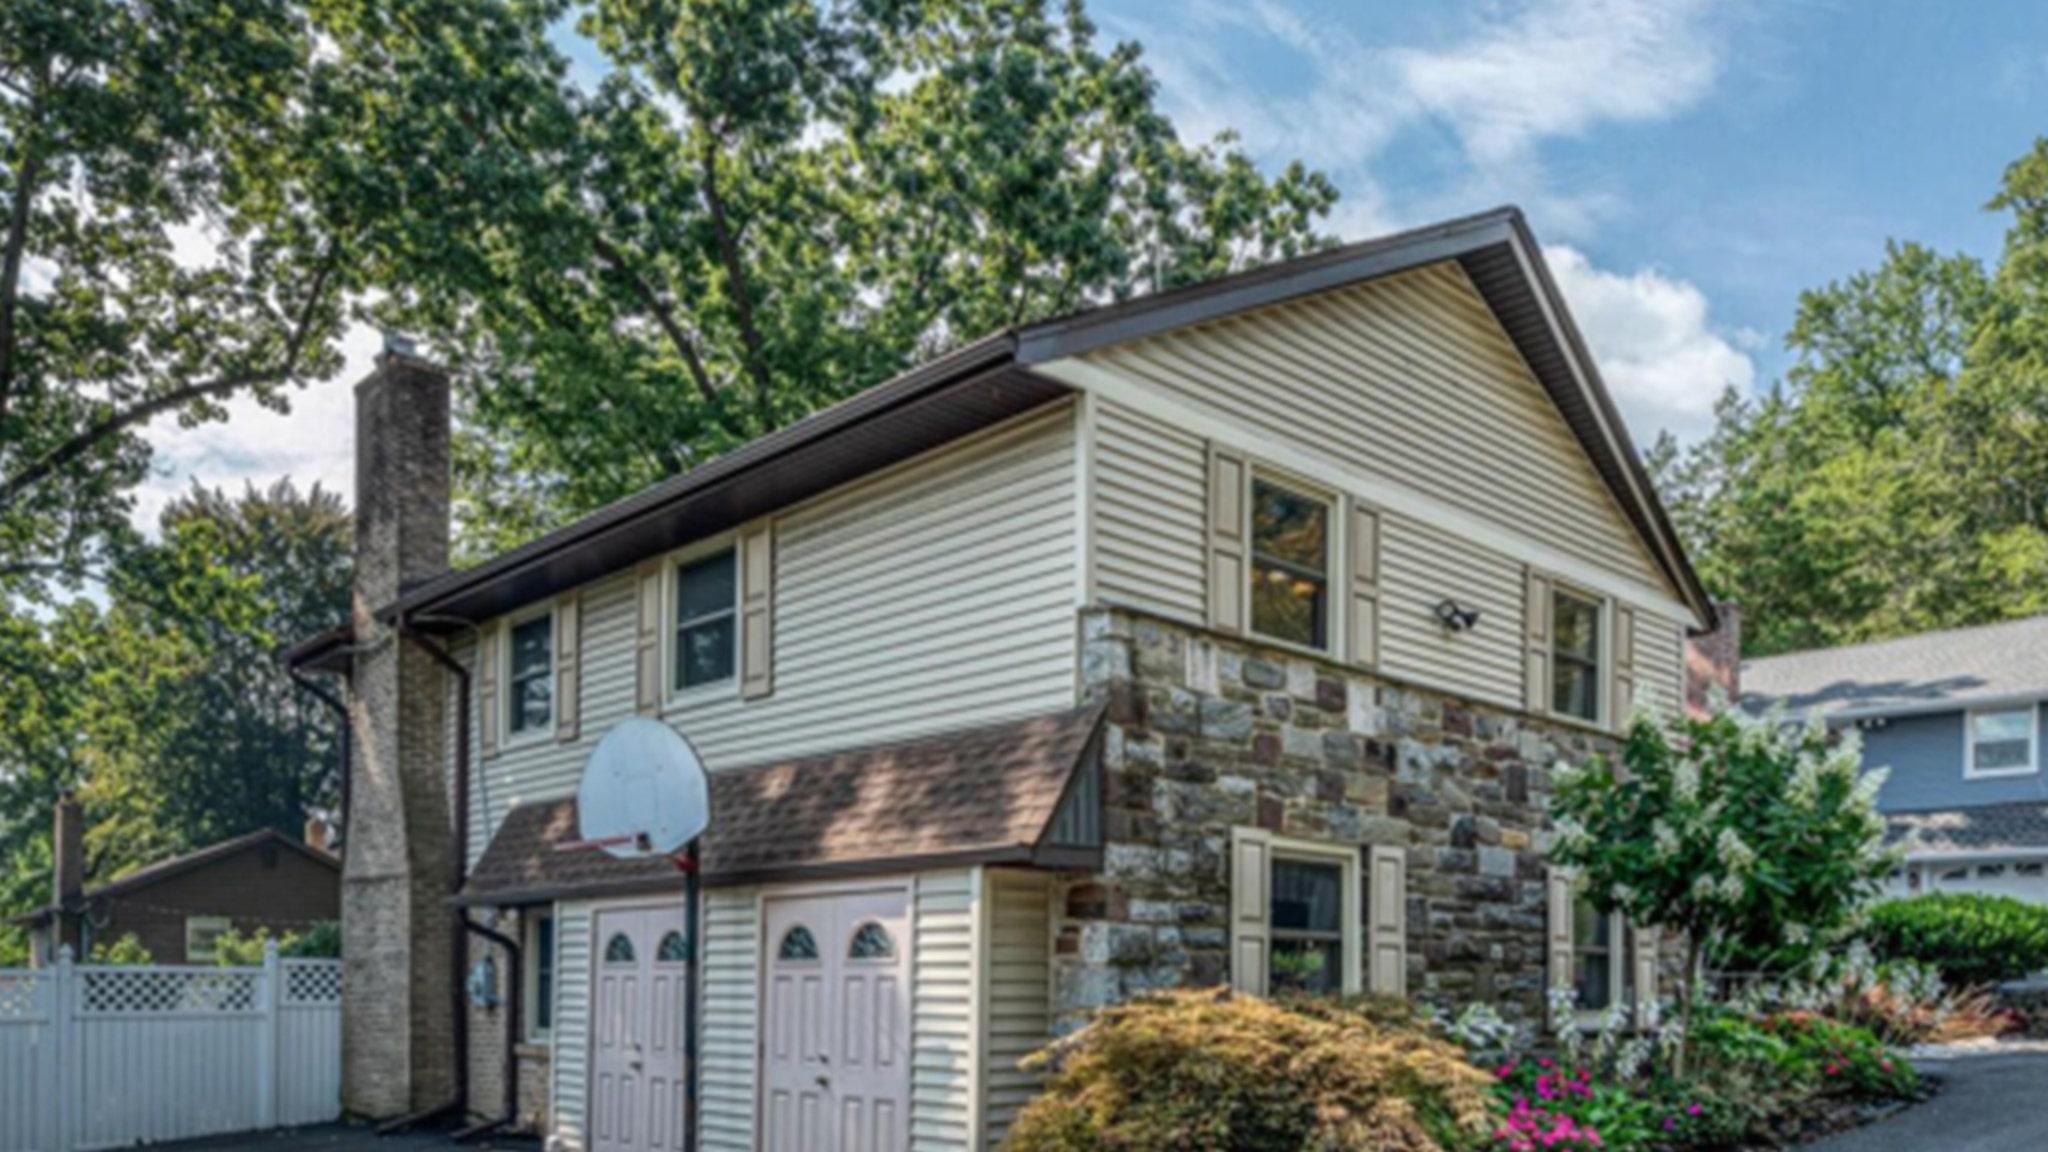 Kobe Bryant Childhood Home Sells For $810k ... Hoop Included!!!